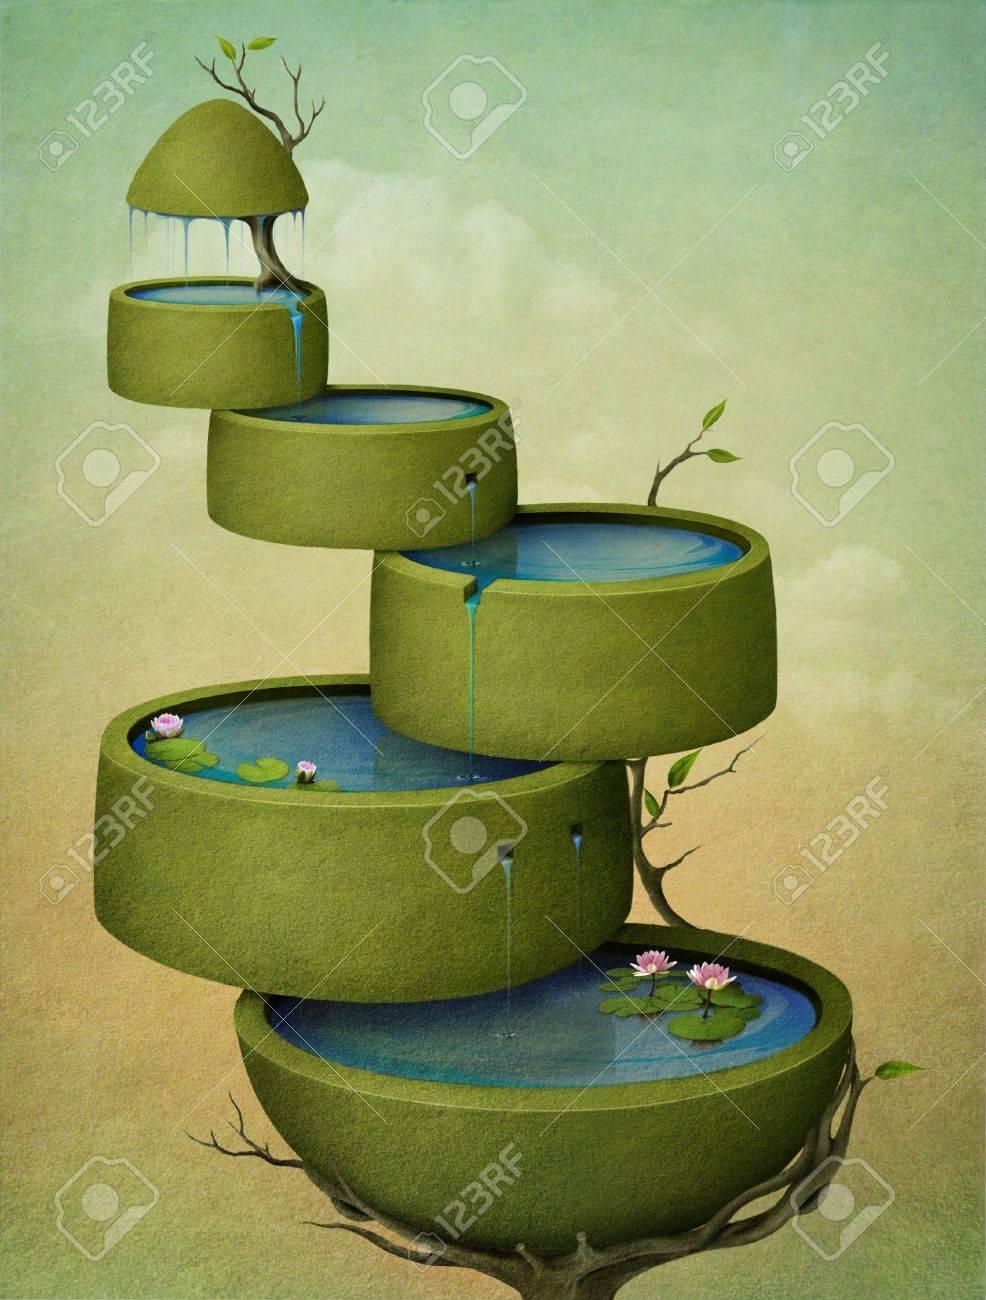 Beautiful greeting card or illustration of tree. Computer Graphics. Stock Illustration - 12879776